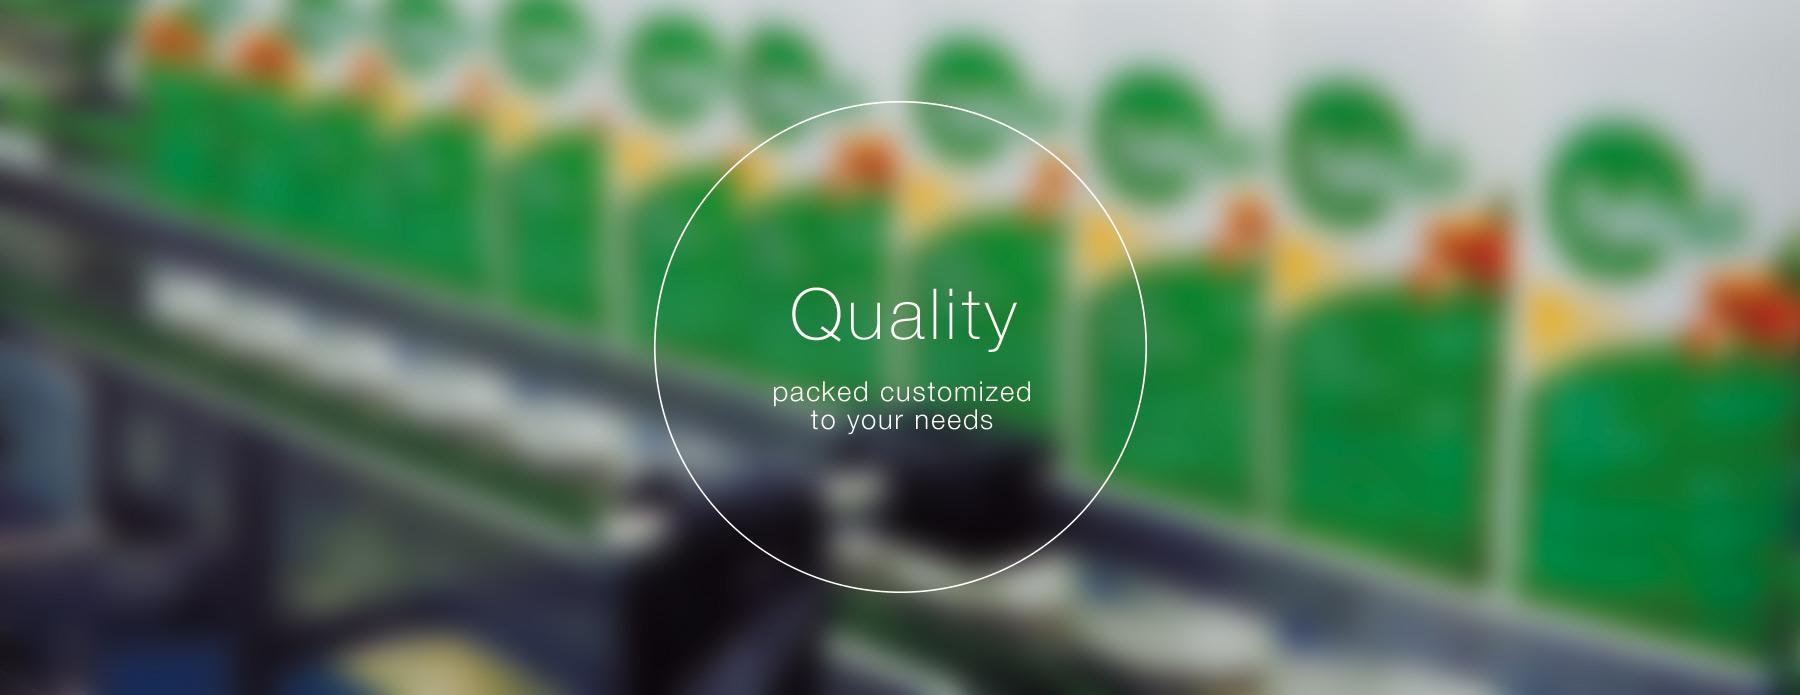 slider-engl-quality